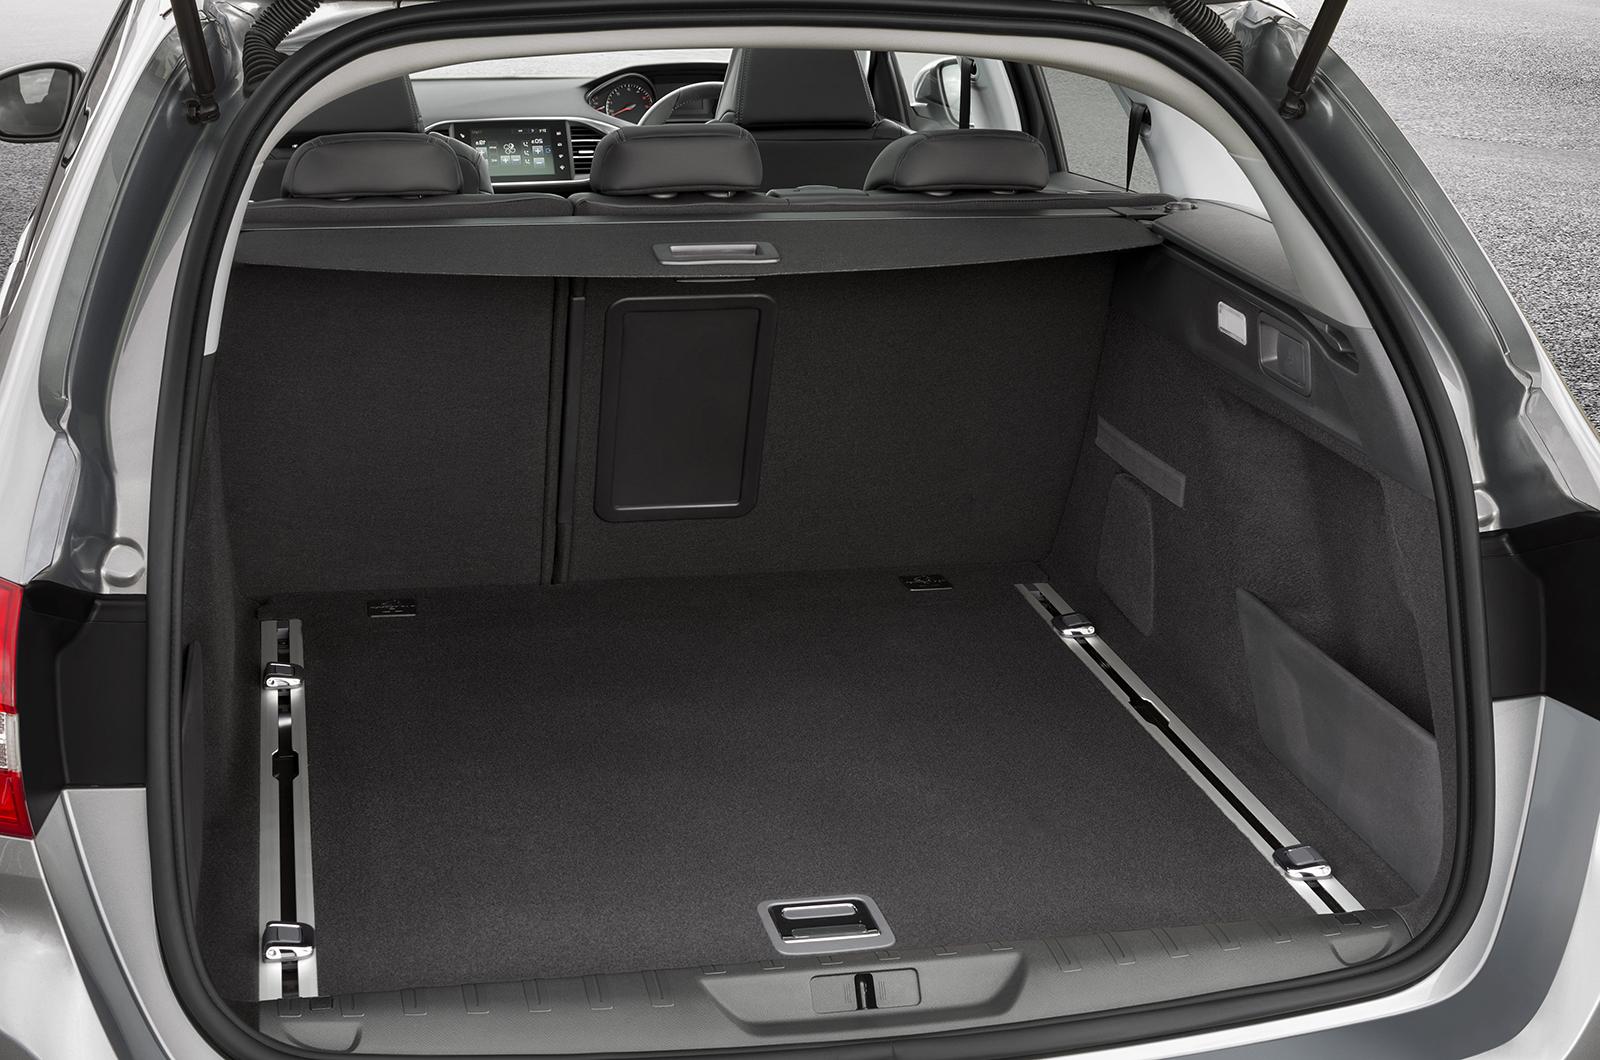 2014 peugeot 308 sw e thp 130 first drive. Black Bedroom Furniture Sets. Home Design Ideas